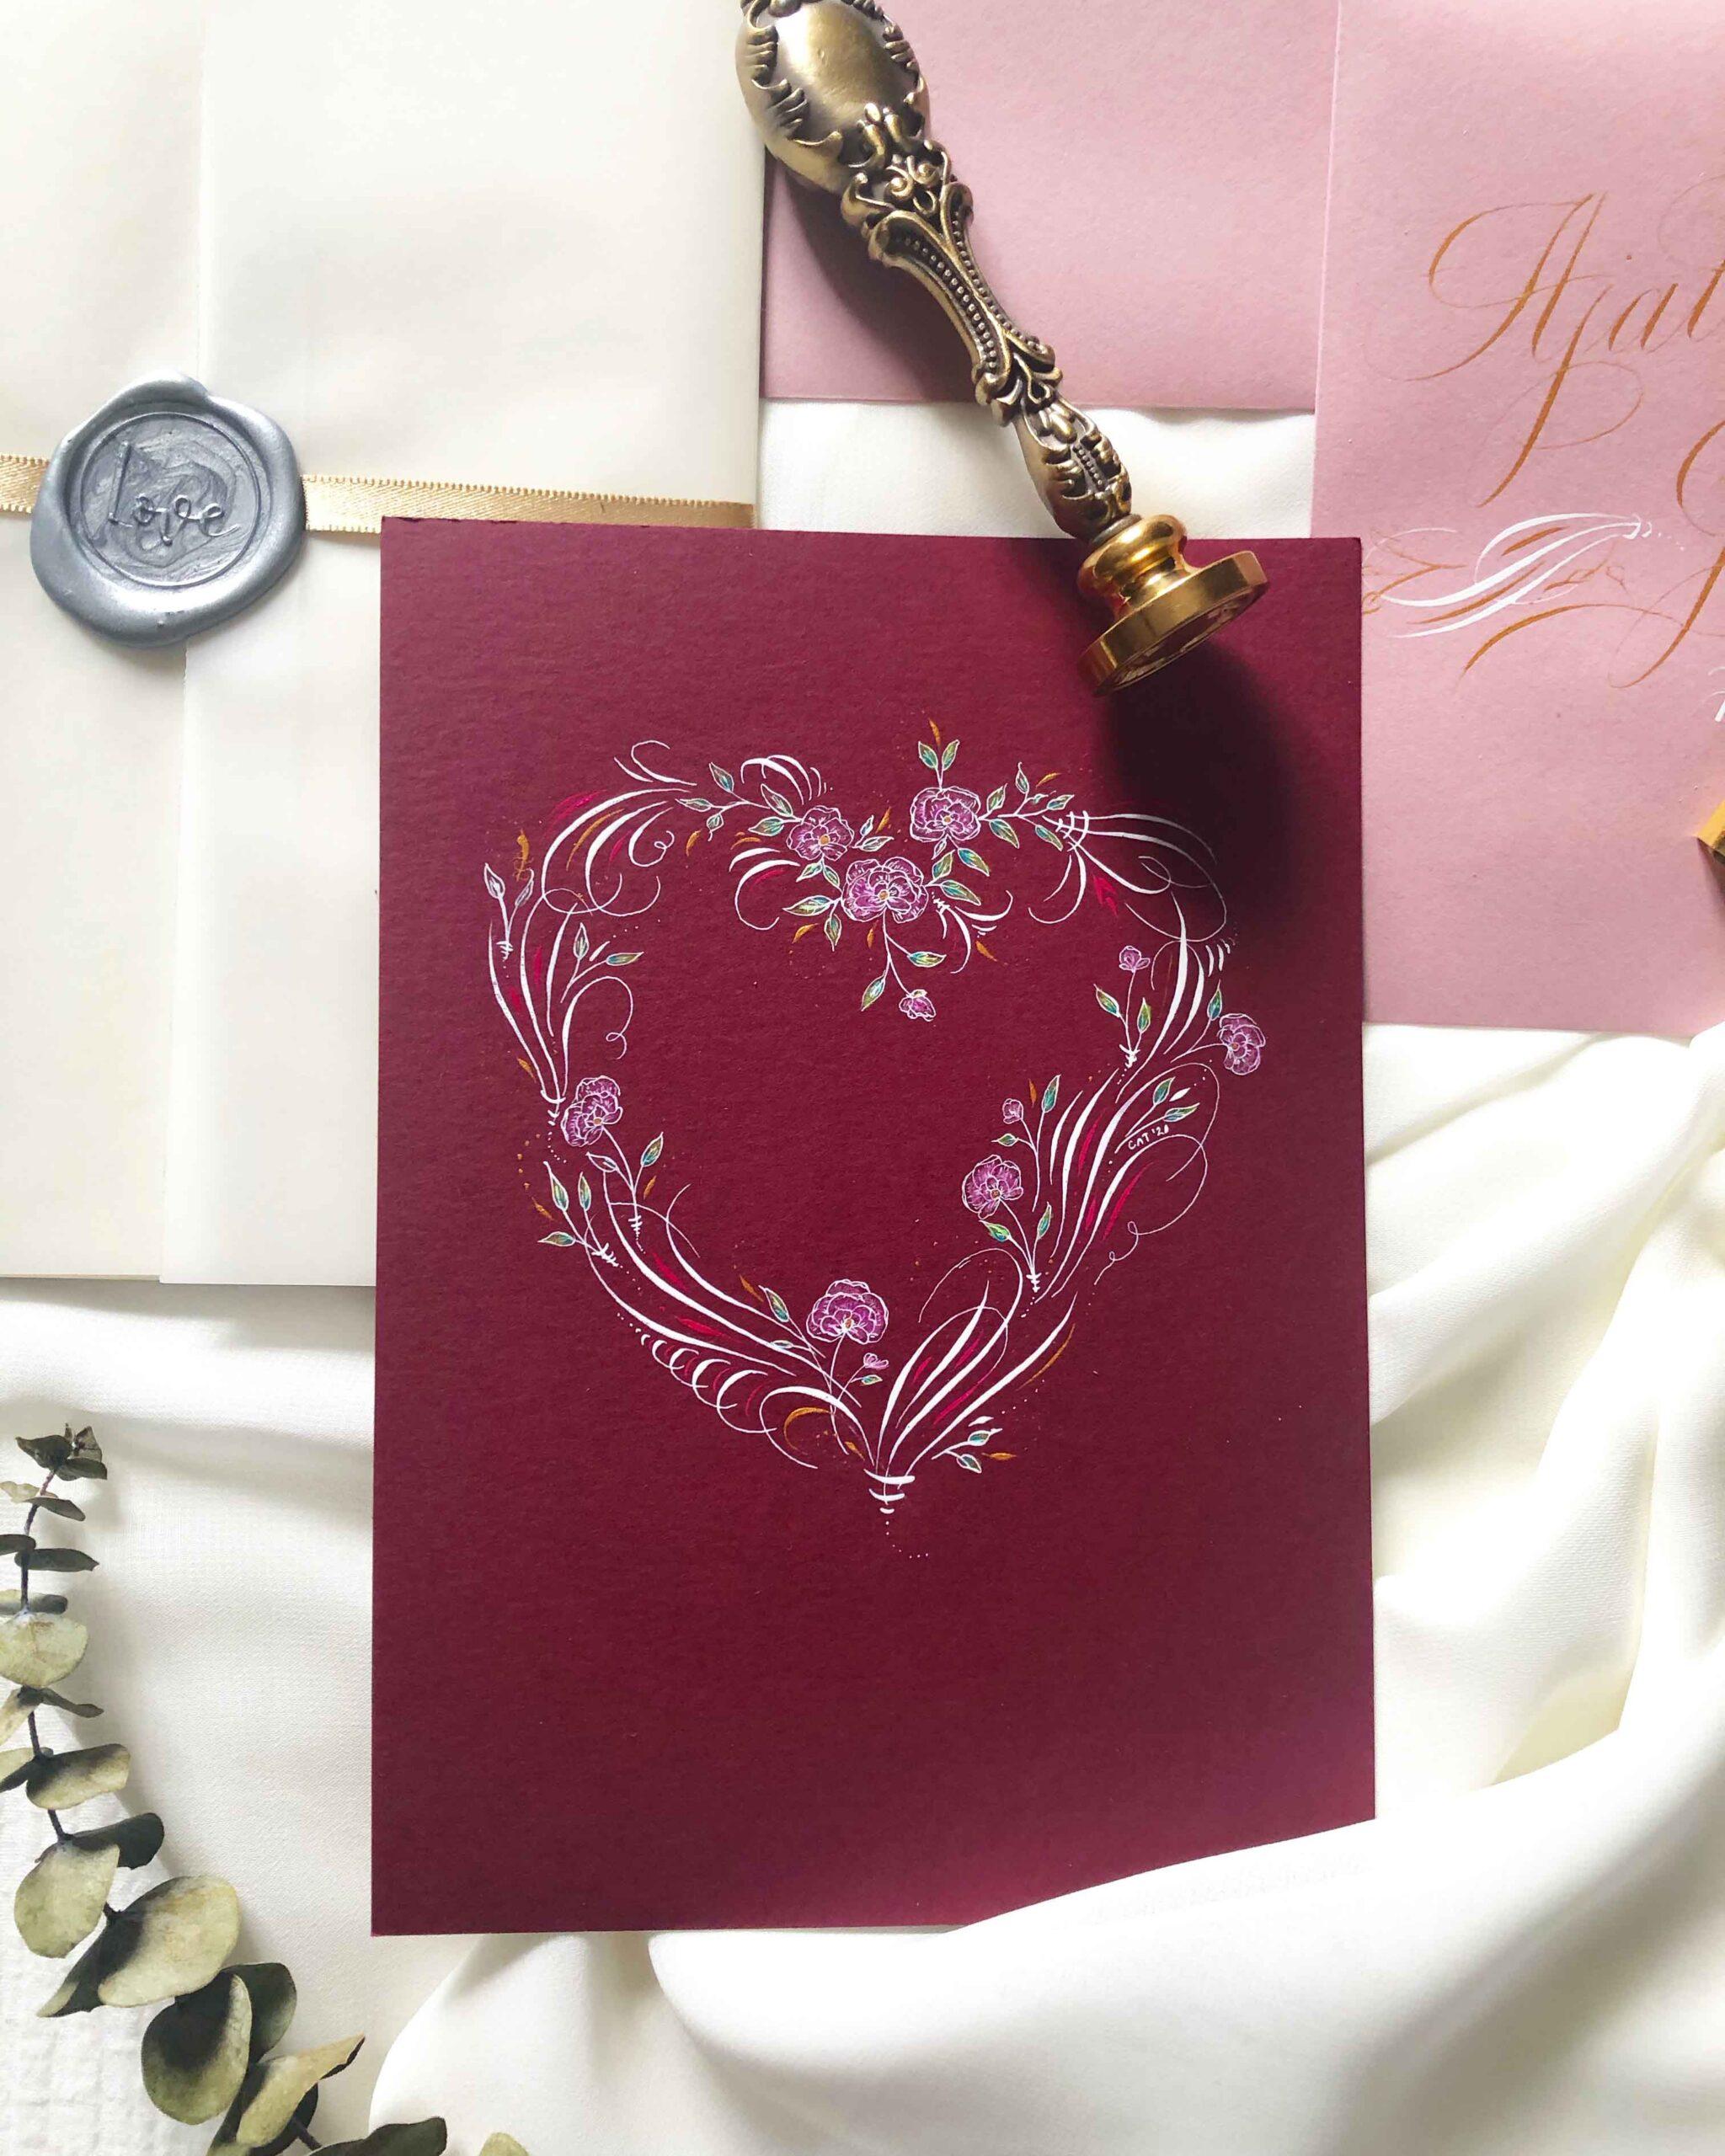 Allocco Design Norfolk, VA Calligraphy   Flourished Heart